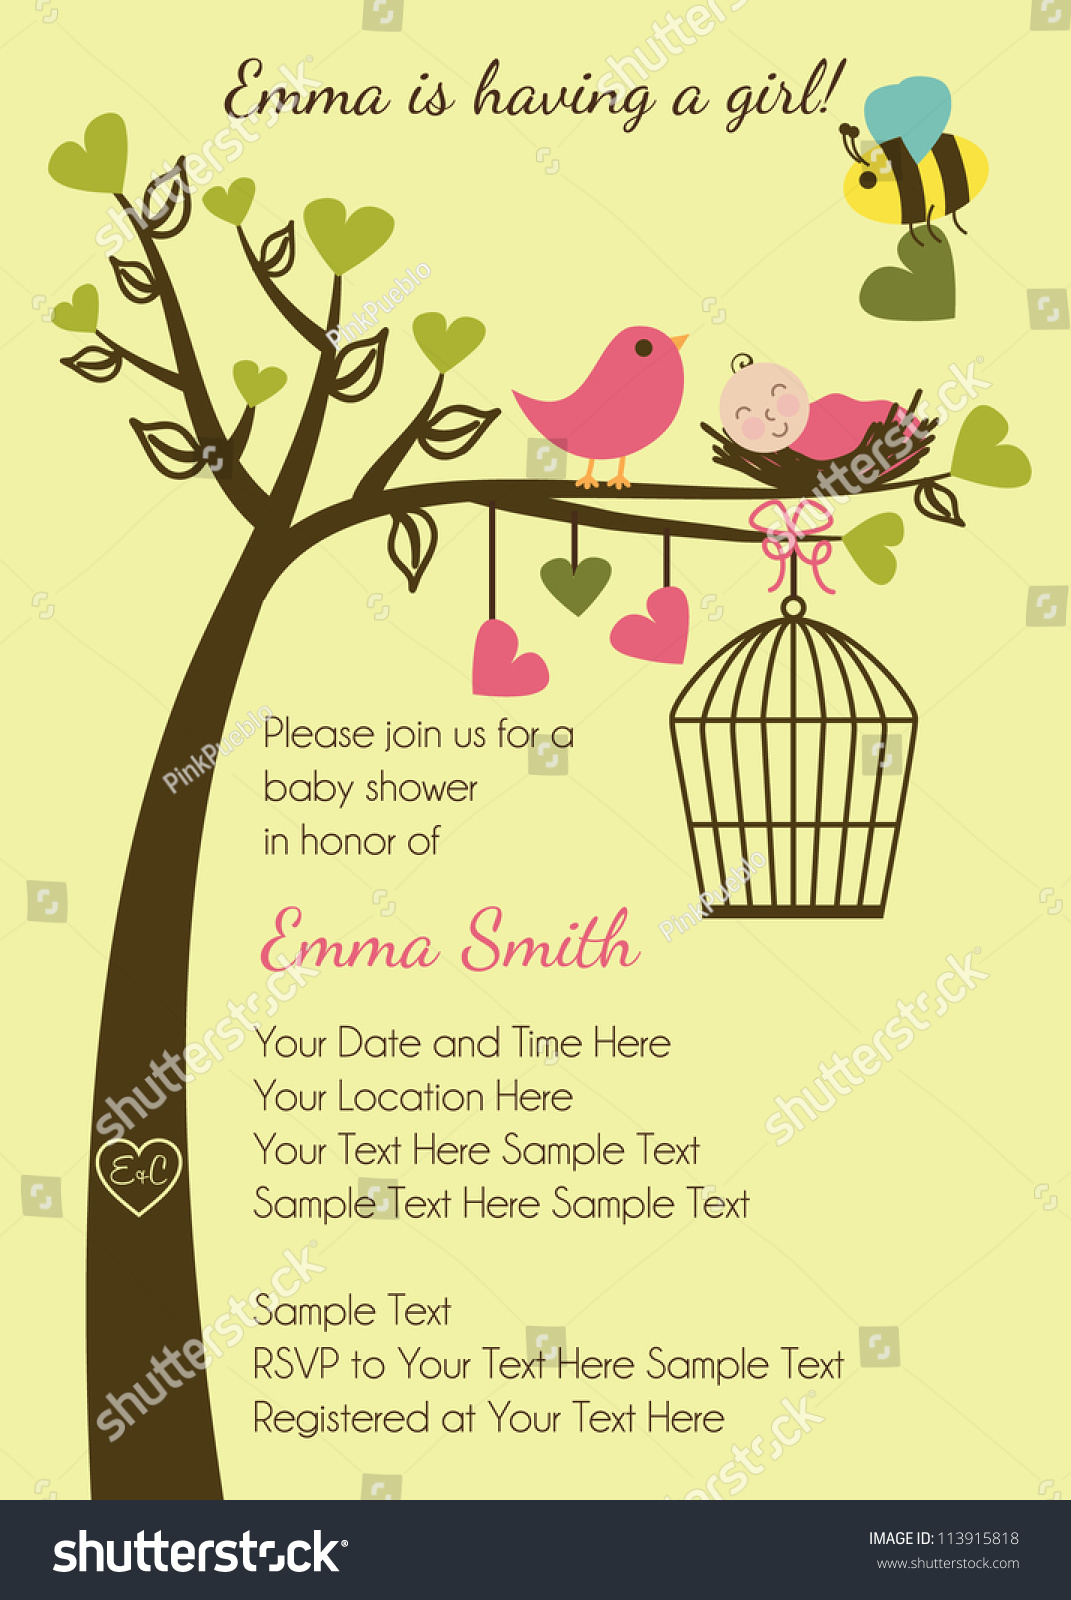 Birds Bees Baby Shower Invitation Stock Vector 113915818 - Shutterstock